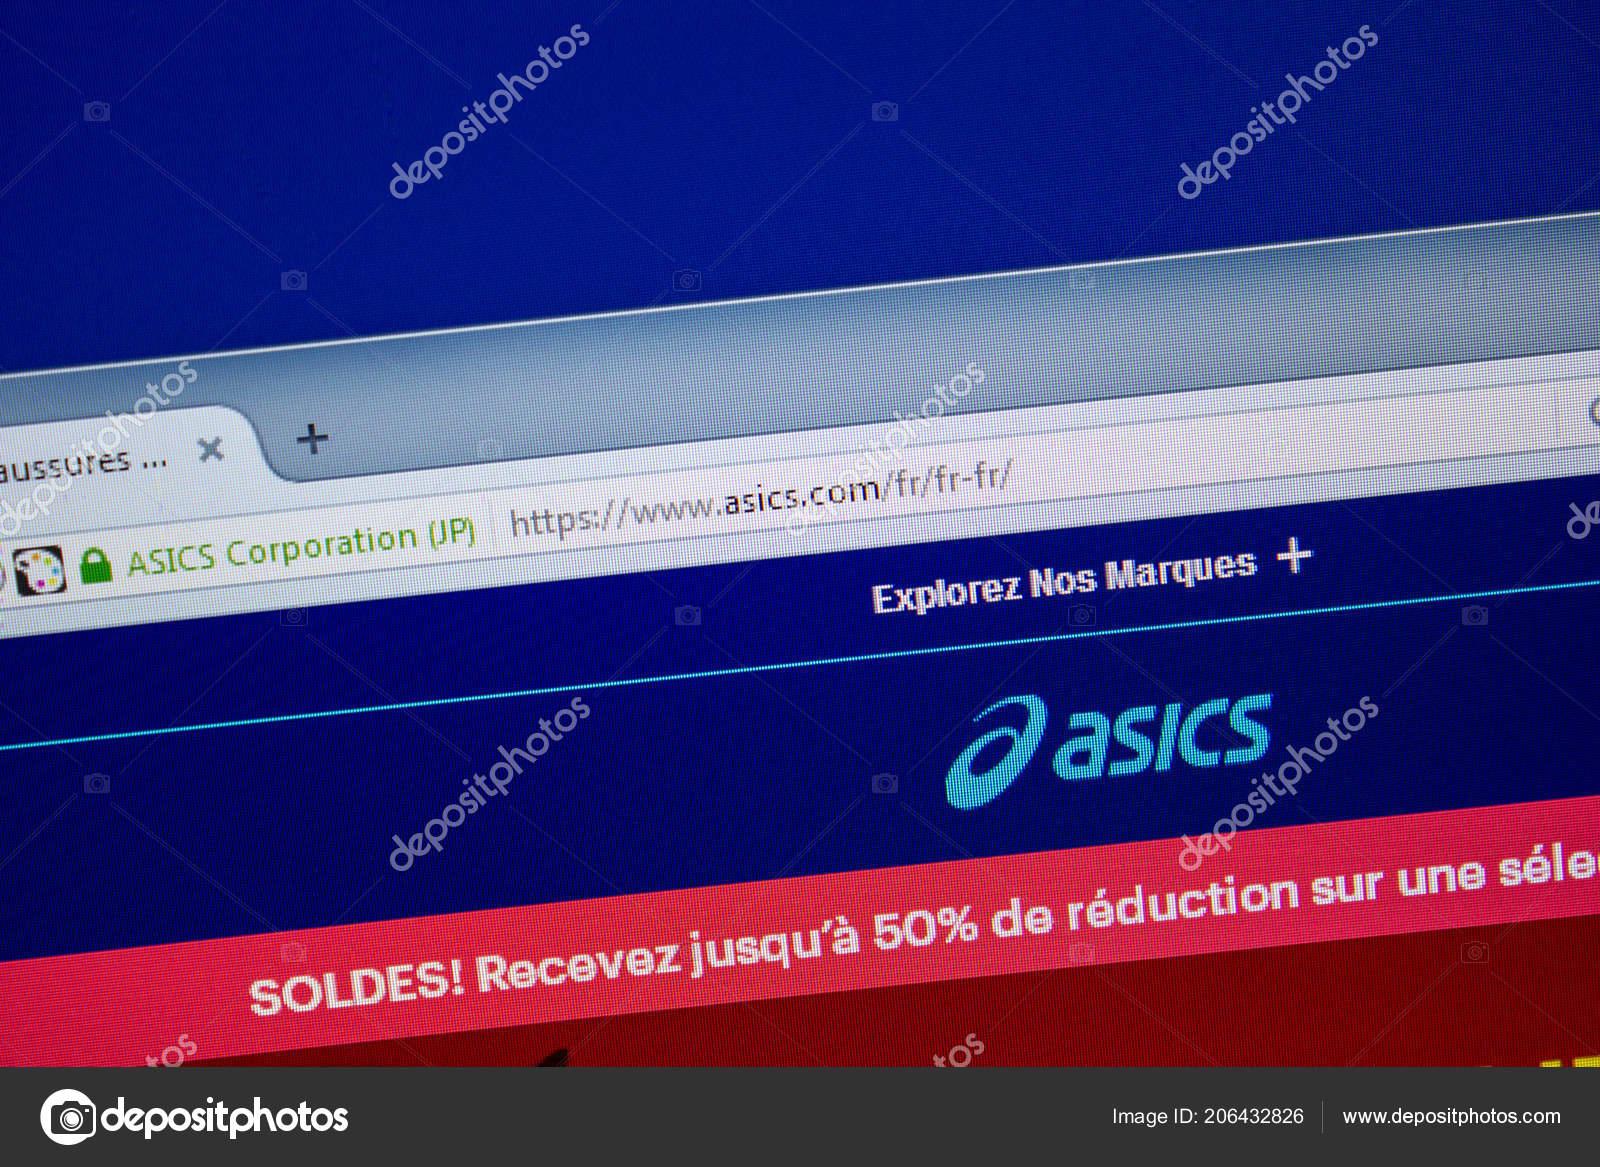 soldes asics.com